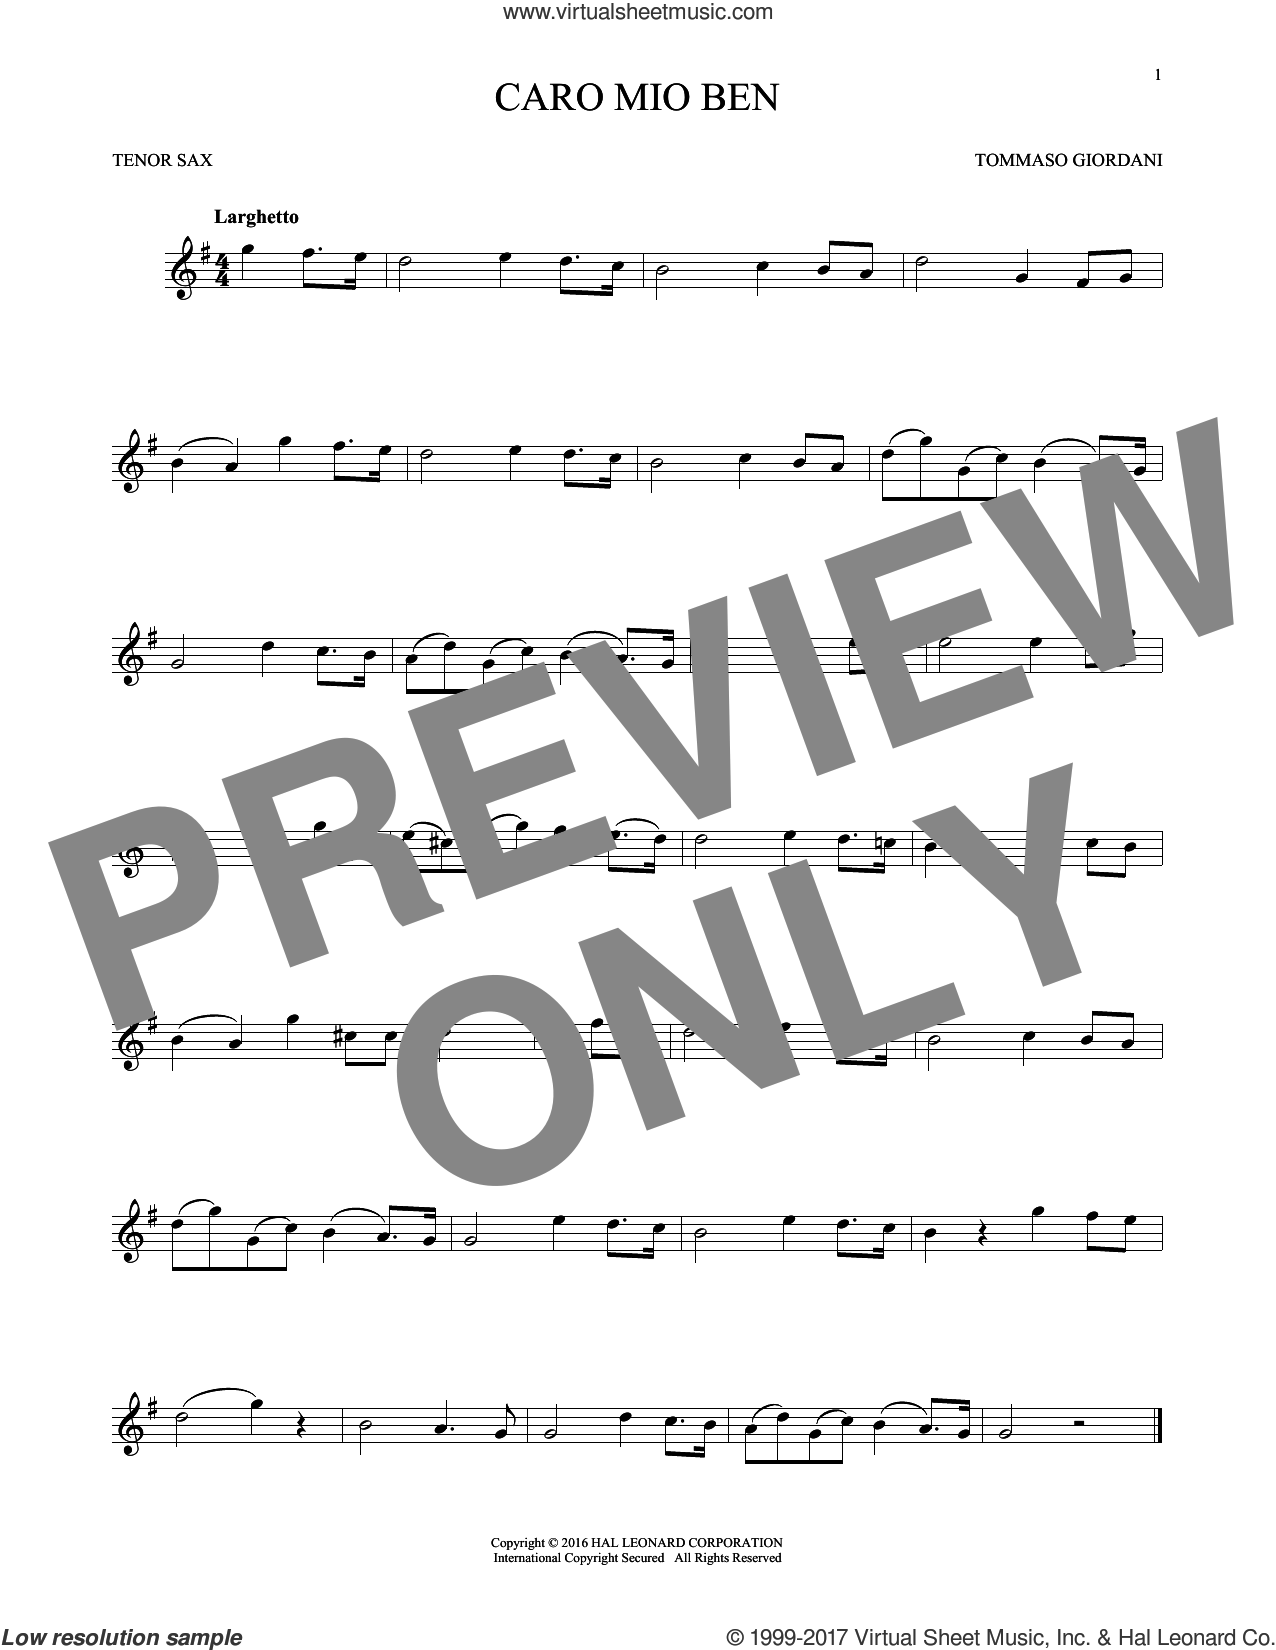 Caro Mio Ben sheet music for tenor saxophone solo by Tommaso Giordani and Anonymous Italian poem, classical score, intermediate skill level